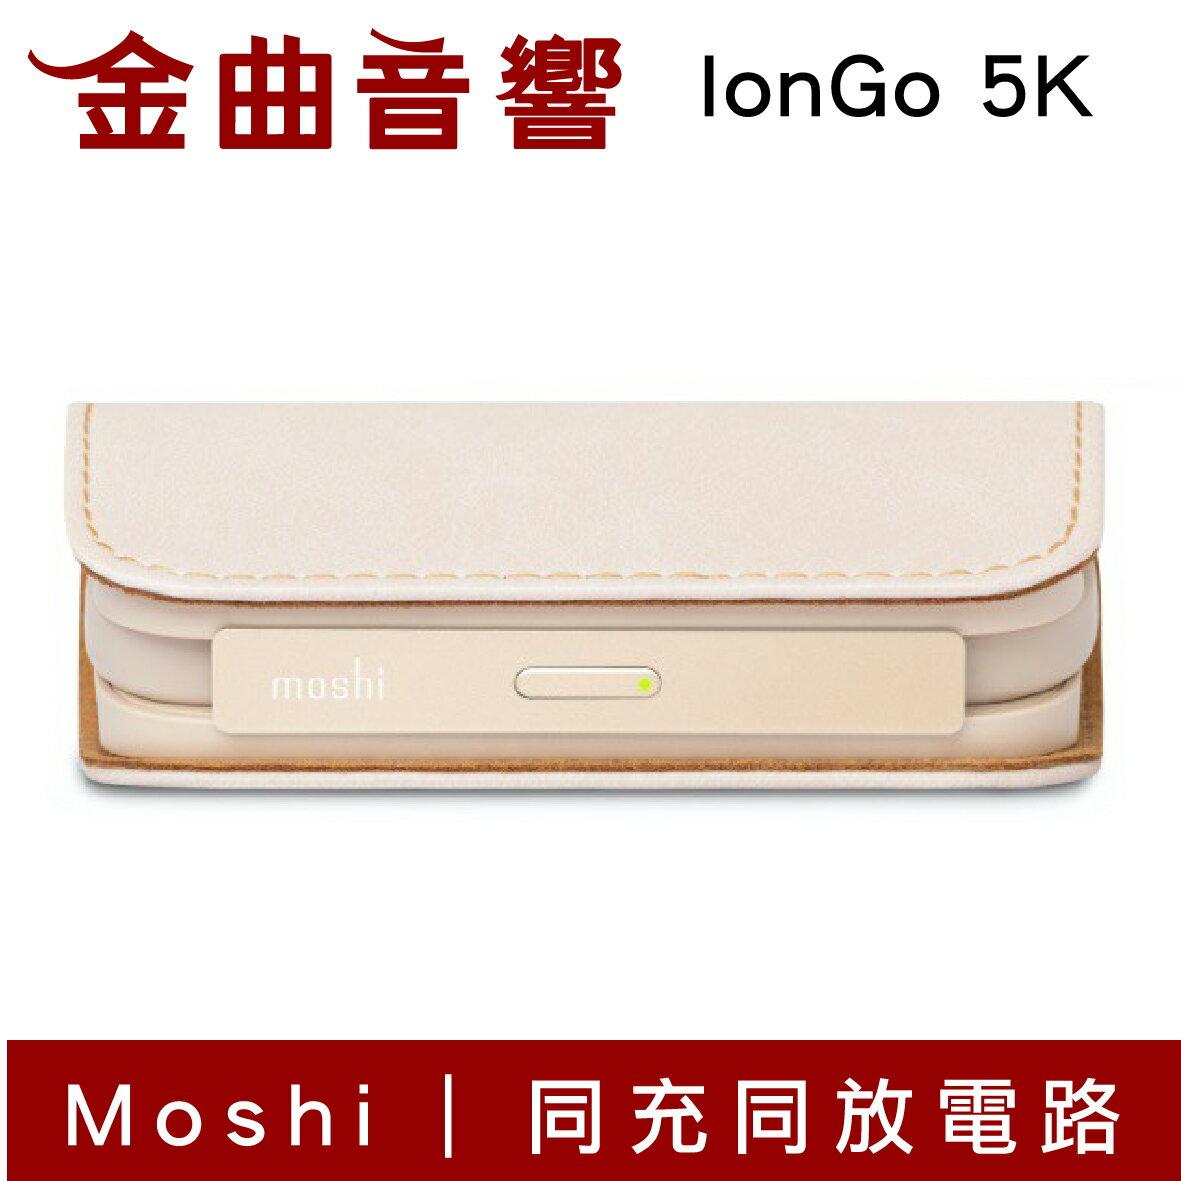 Moshi IonGo 5K 白色 帶線行動電源 (USB 及 Lightning,iPhone專用)   金曲音響